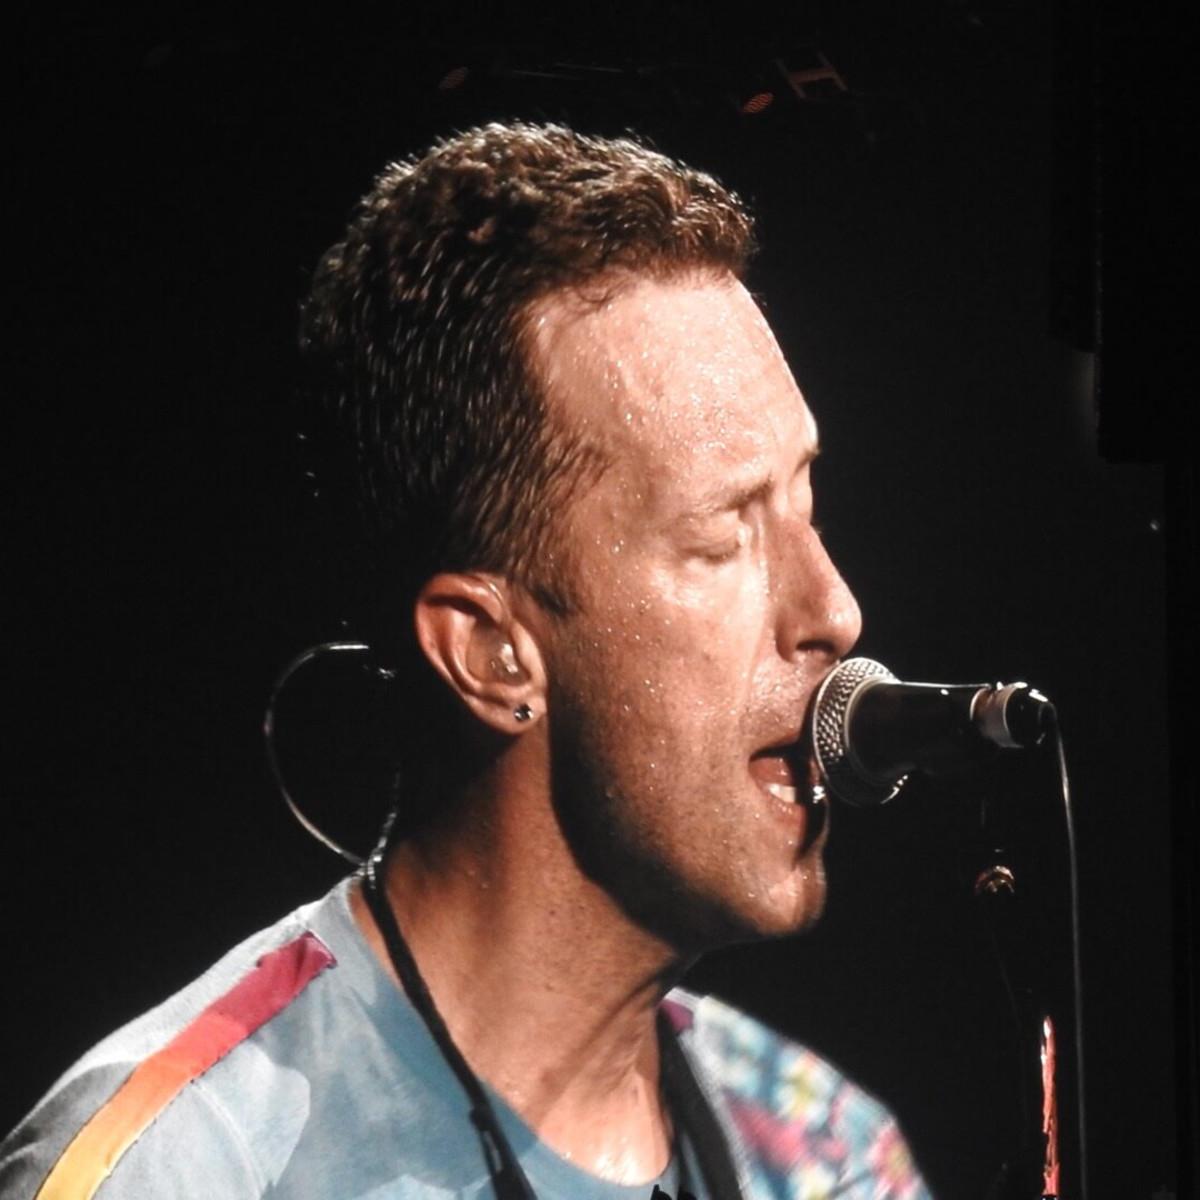 Chris Martin, Coldplay